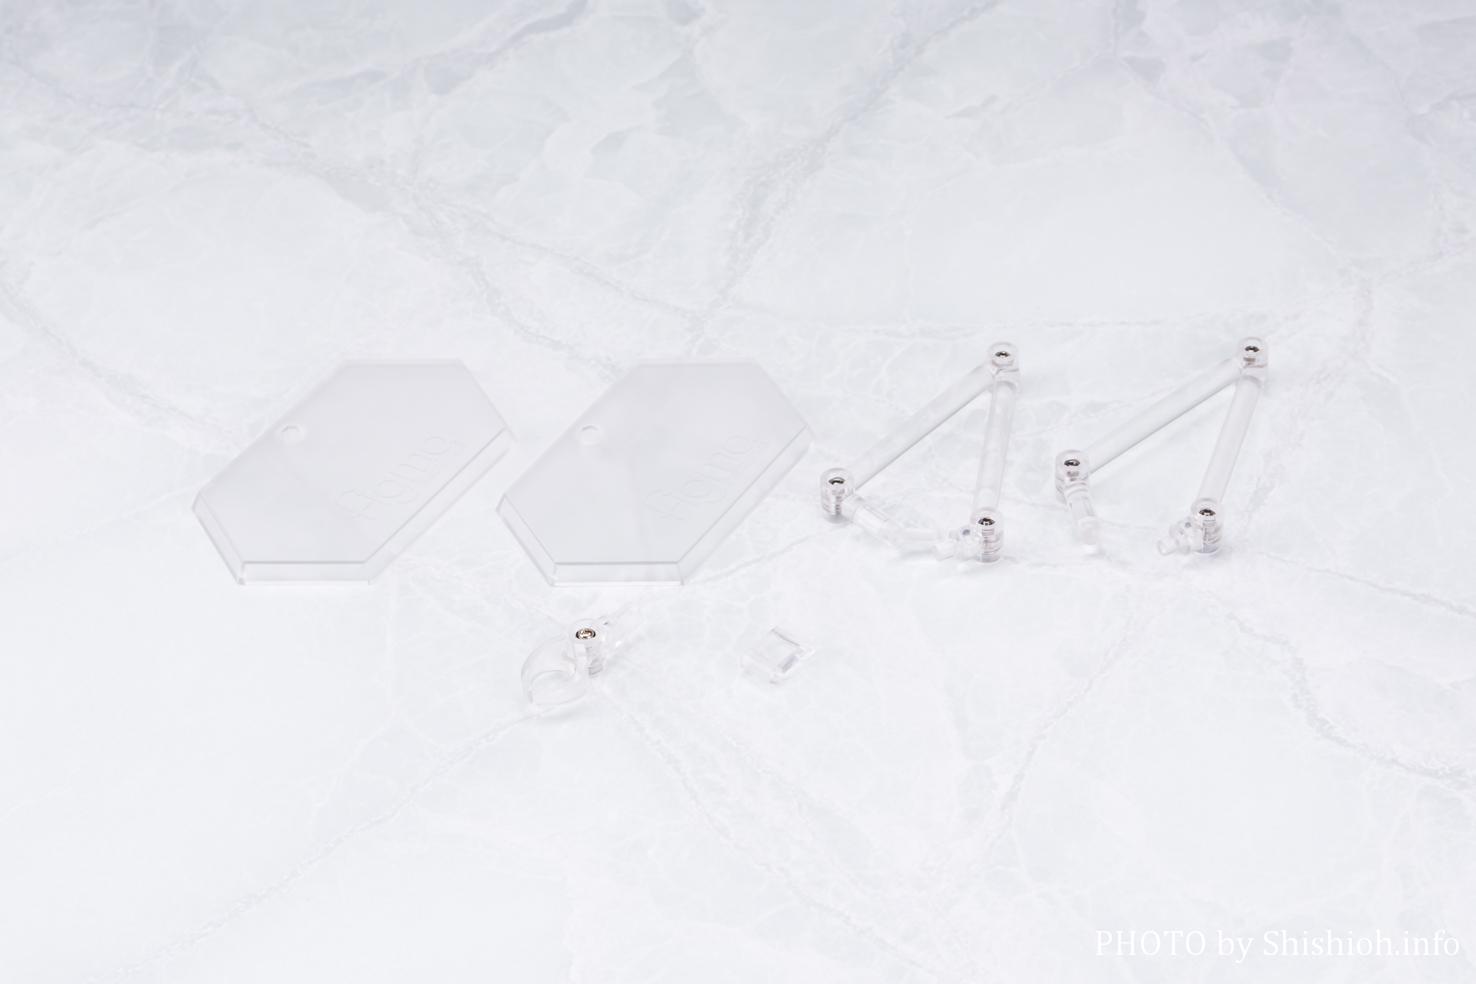 figma 321 シールダー/マシュ・キリエライト